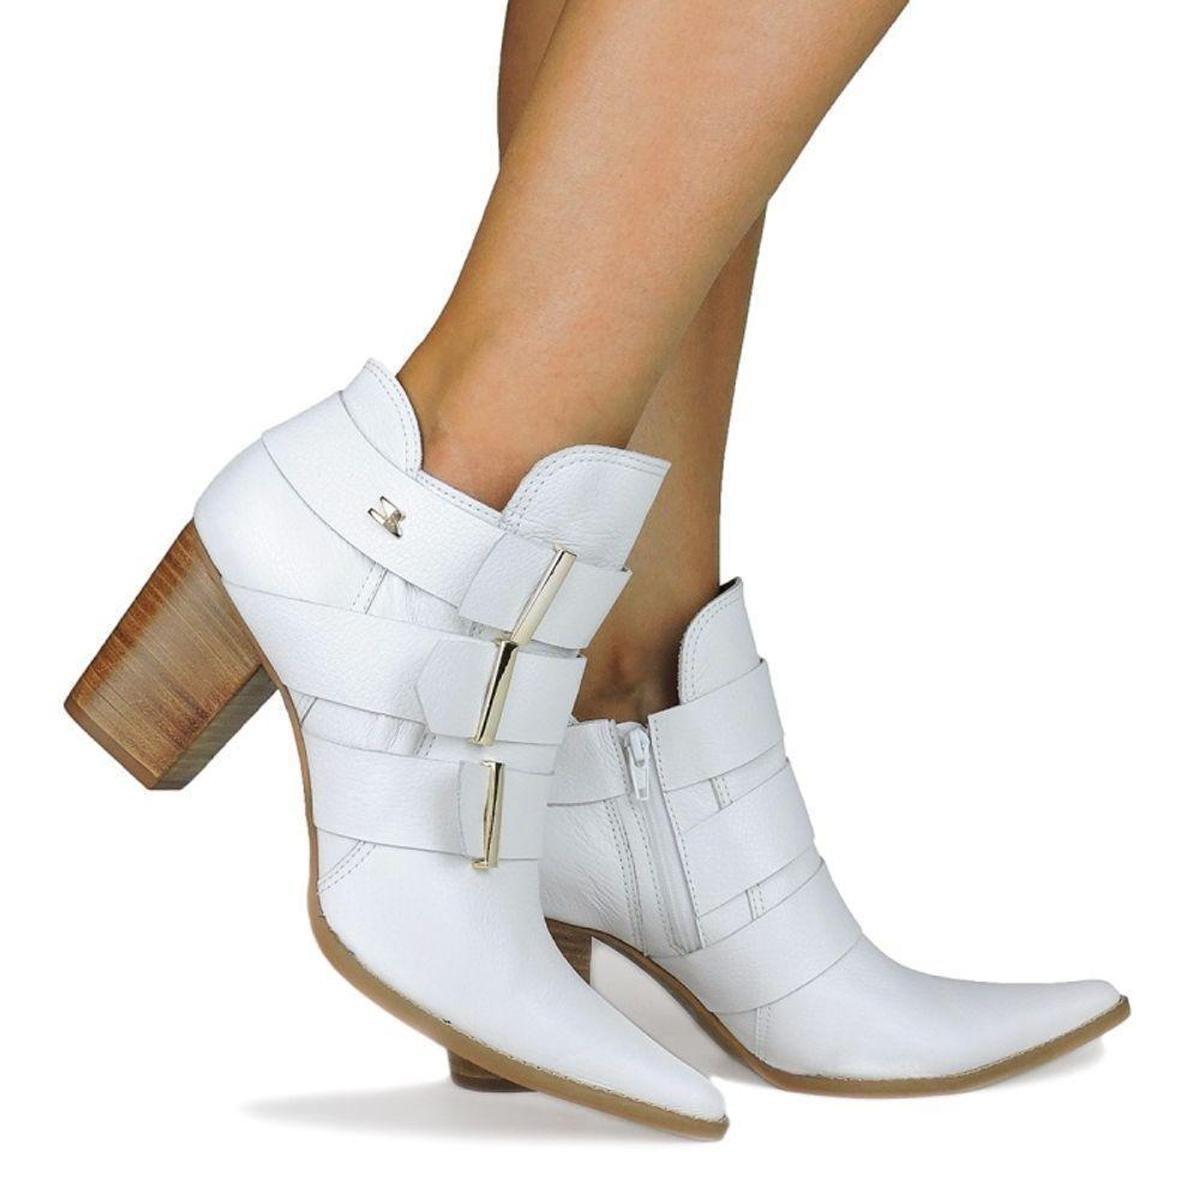 Boot Branco Ankle Feminino Boot Mirtz Couro Dina Ankle 60Eqrx0